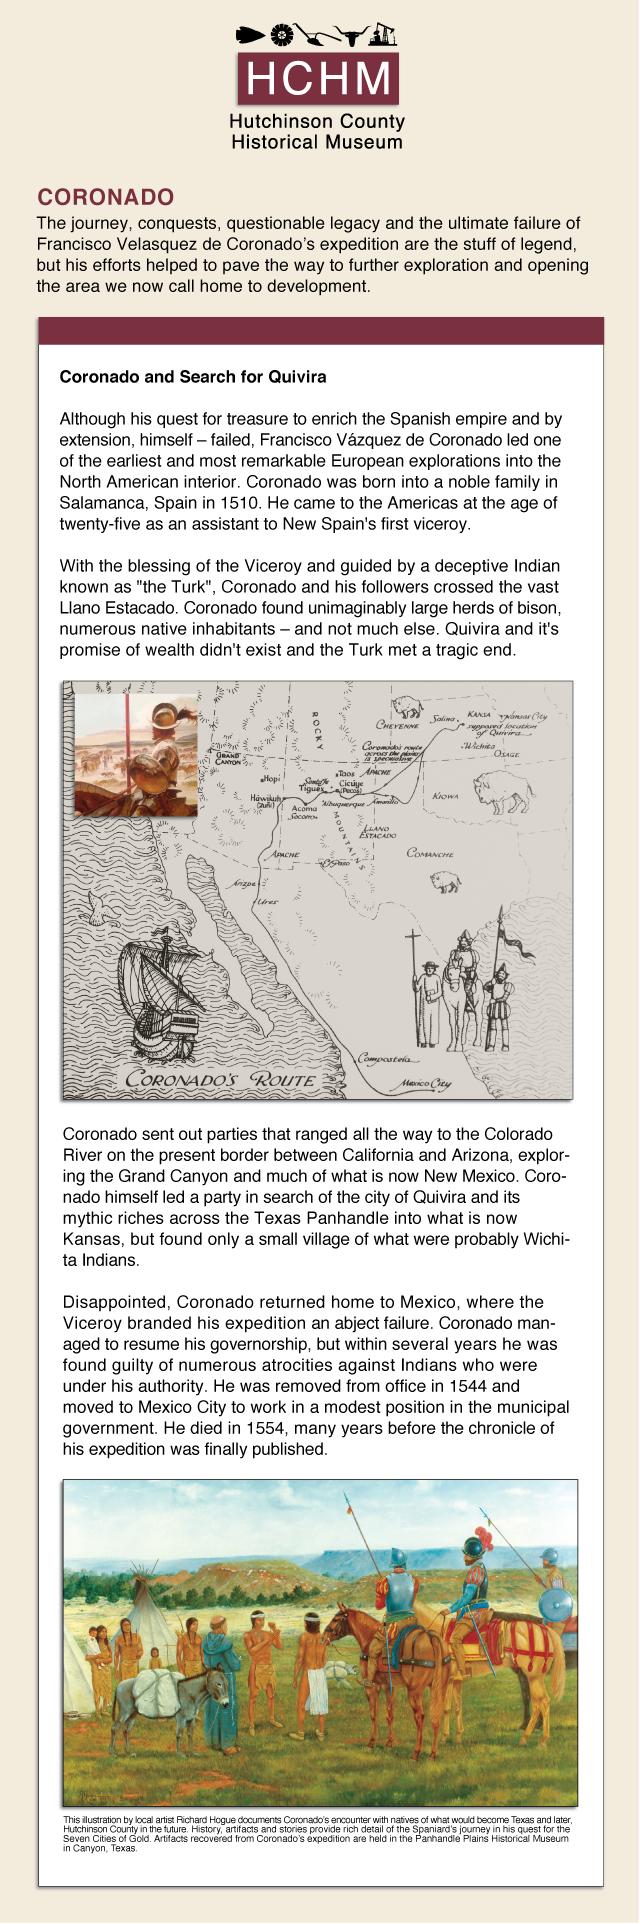 Coronado-Mobile